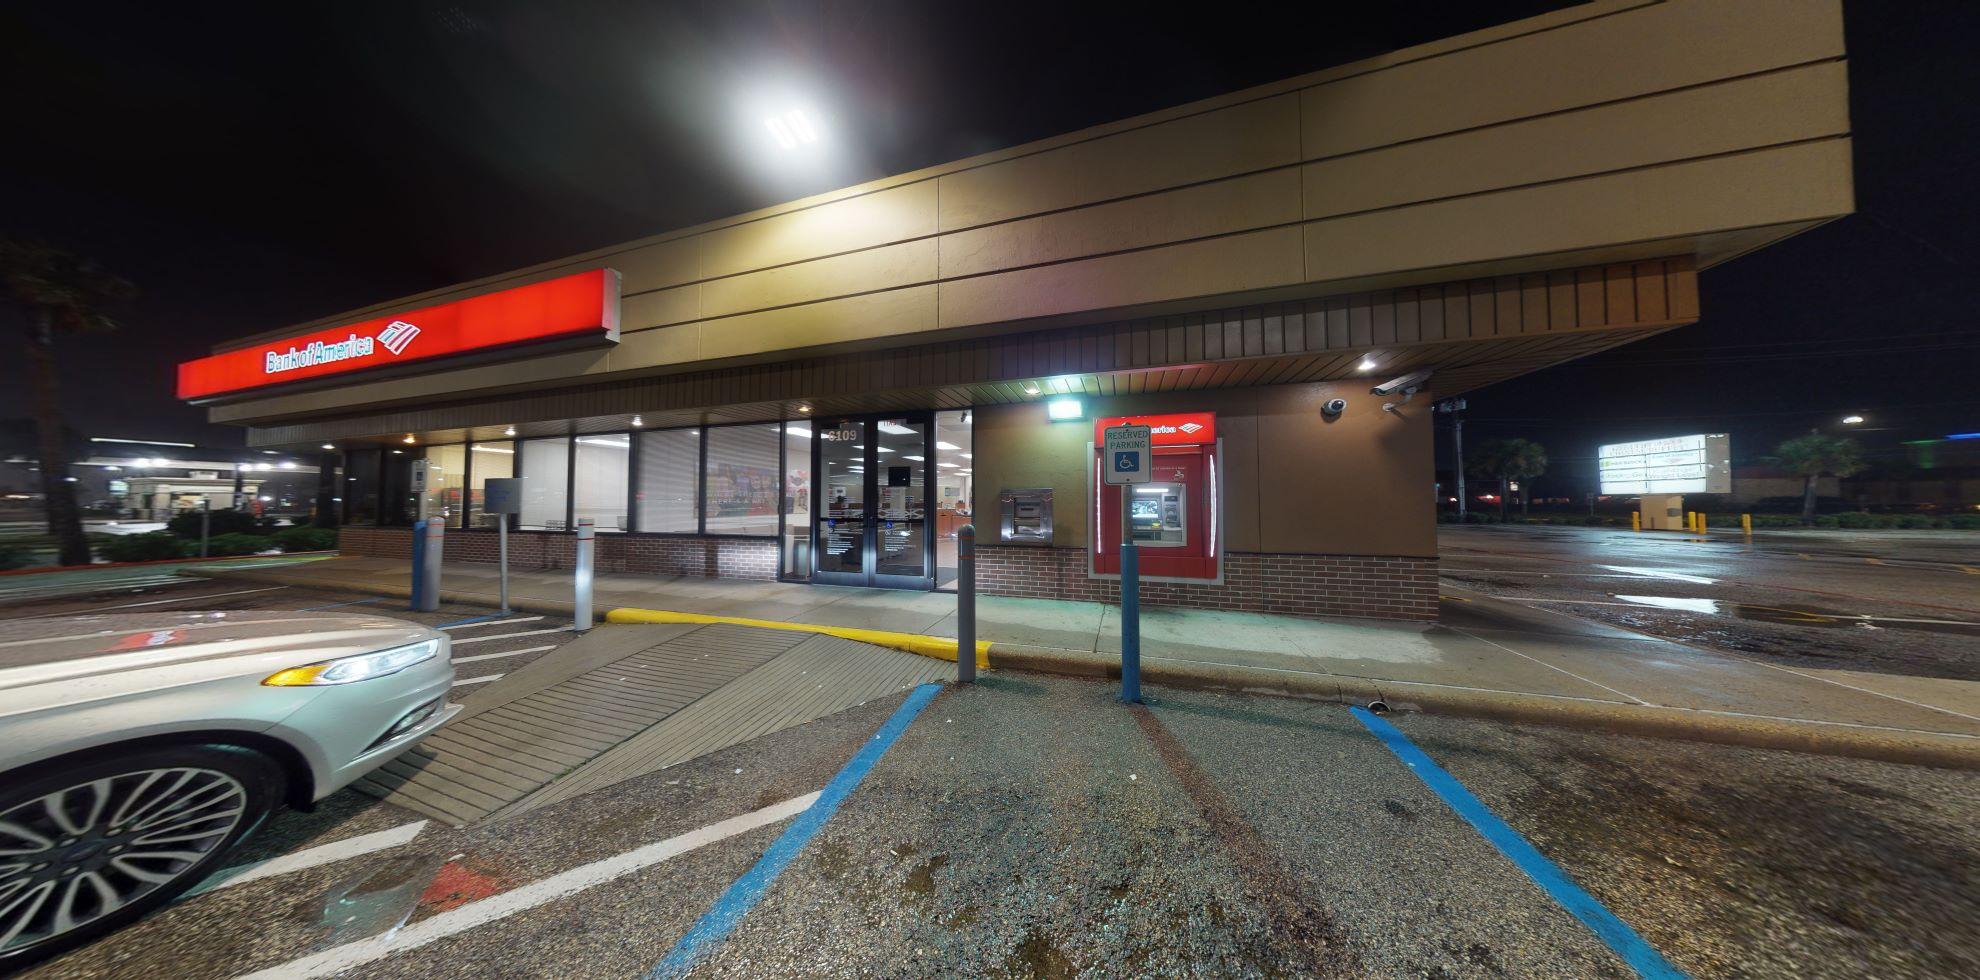 Bank of America financial center with walk-up ATM   6109 Central City Blvd, Galveston, TX 77551